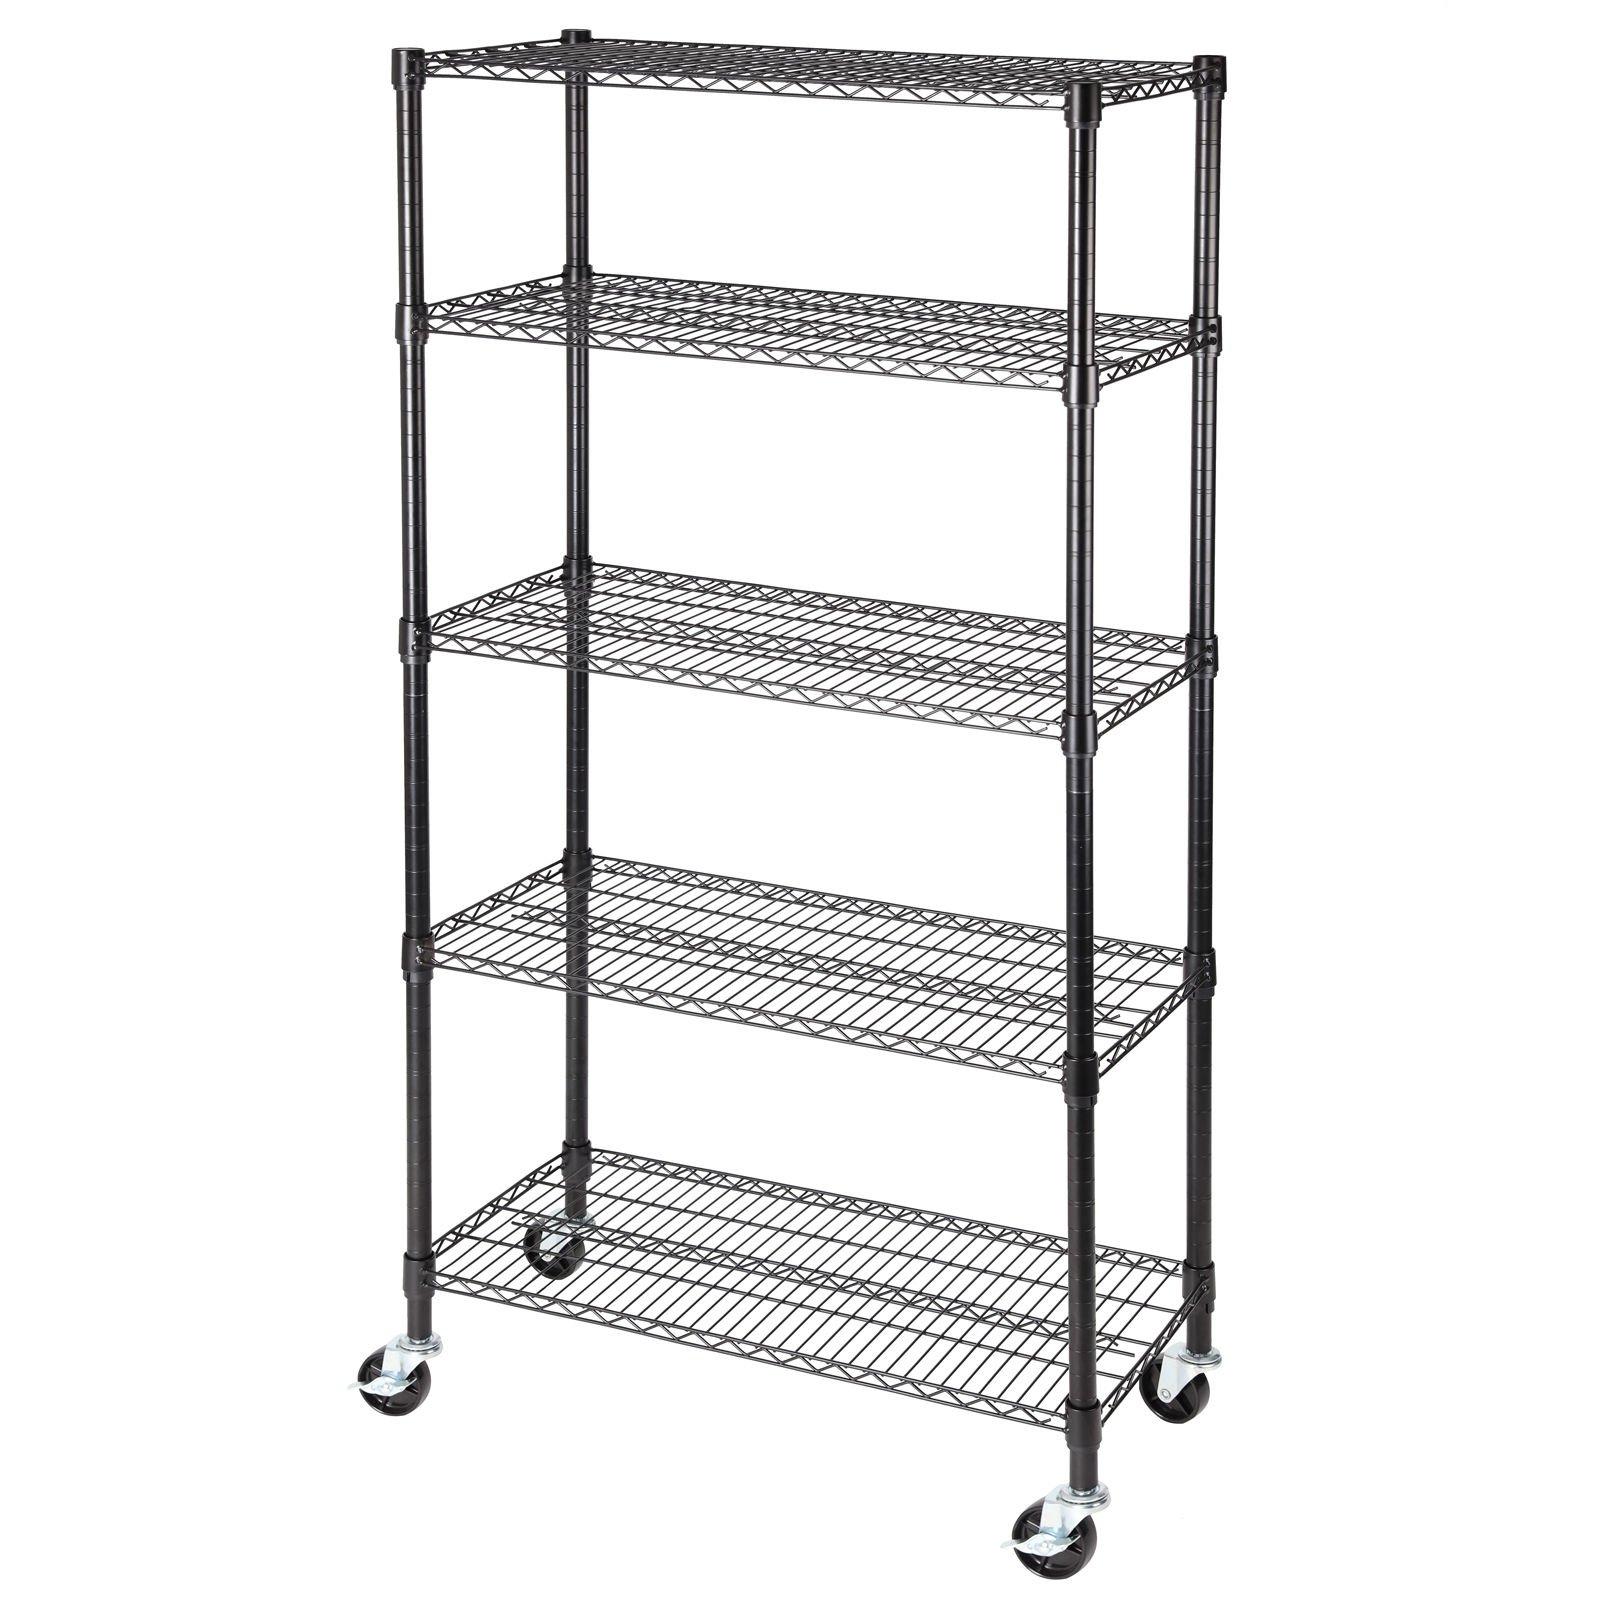 5 Tier Adjustable Layer Wire Shelving Rack Heavy Duty 60 inch x30 inch x14 inch Steel Shelf